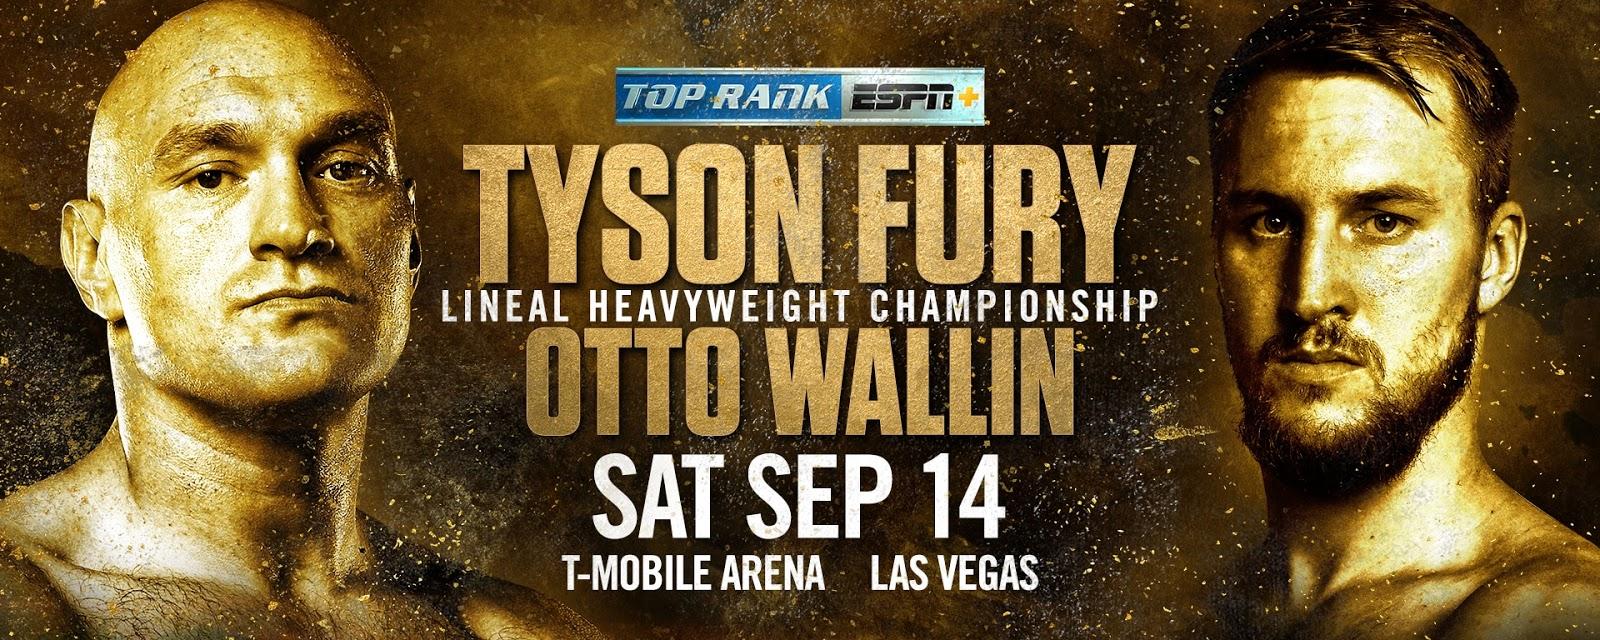 ESPN, ESPN+ to be Exclusive U S  Broadcaster of Fury-Wallin